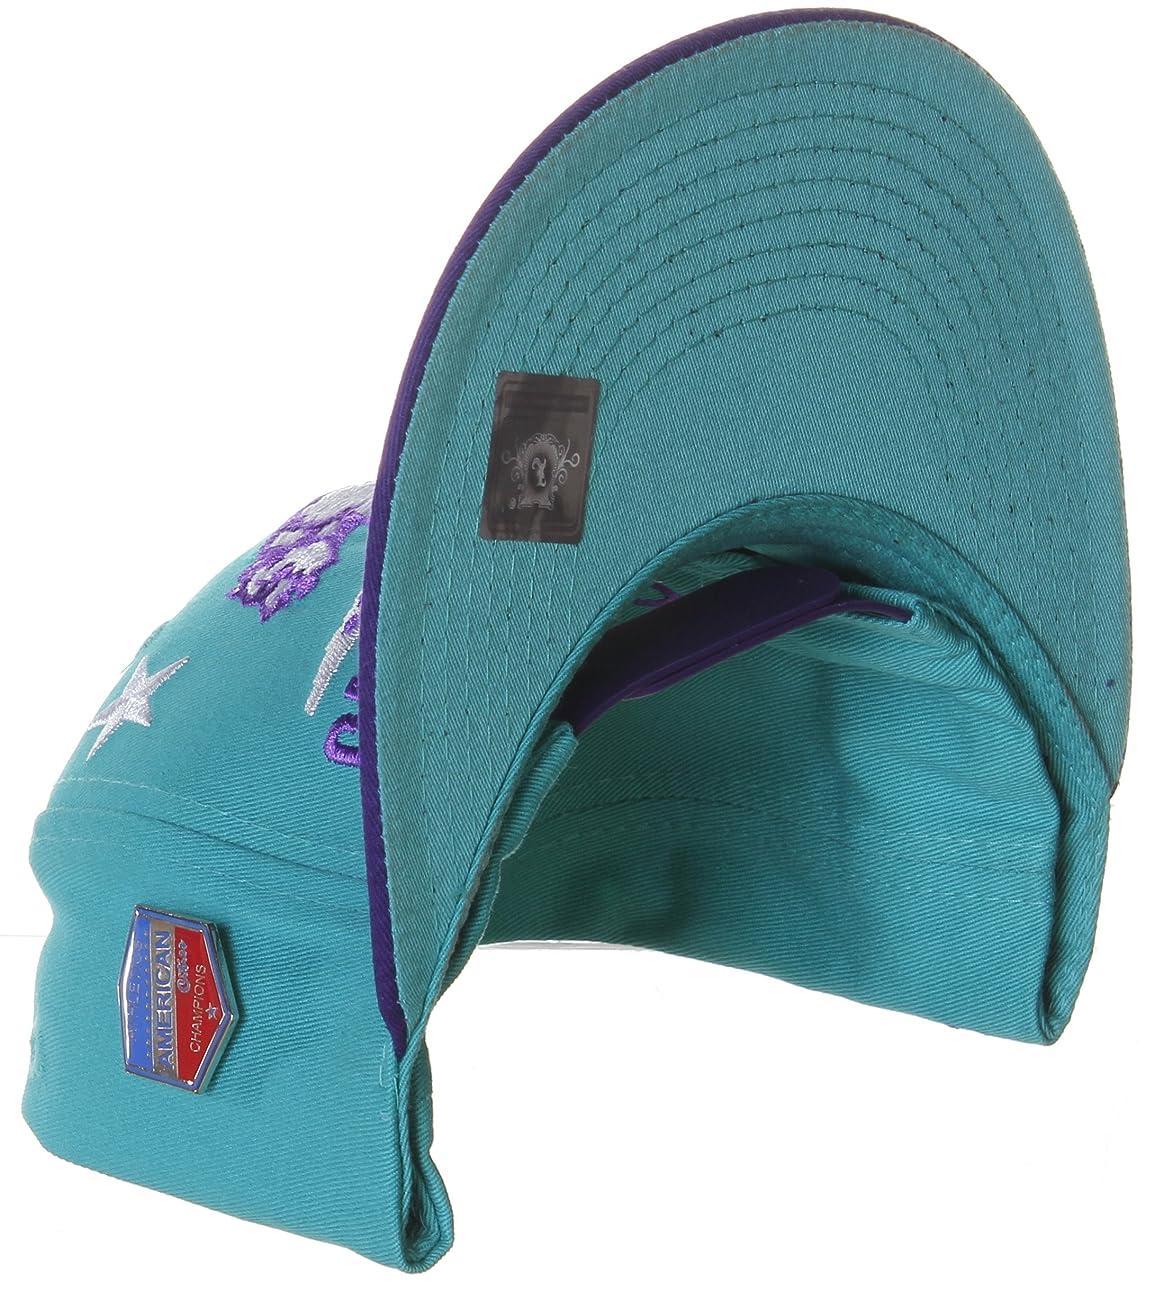 California Republic Flat Bill Vintage Style Snapback Hat Cap 5